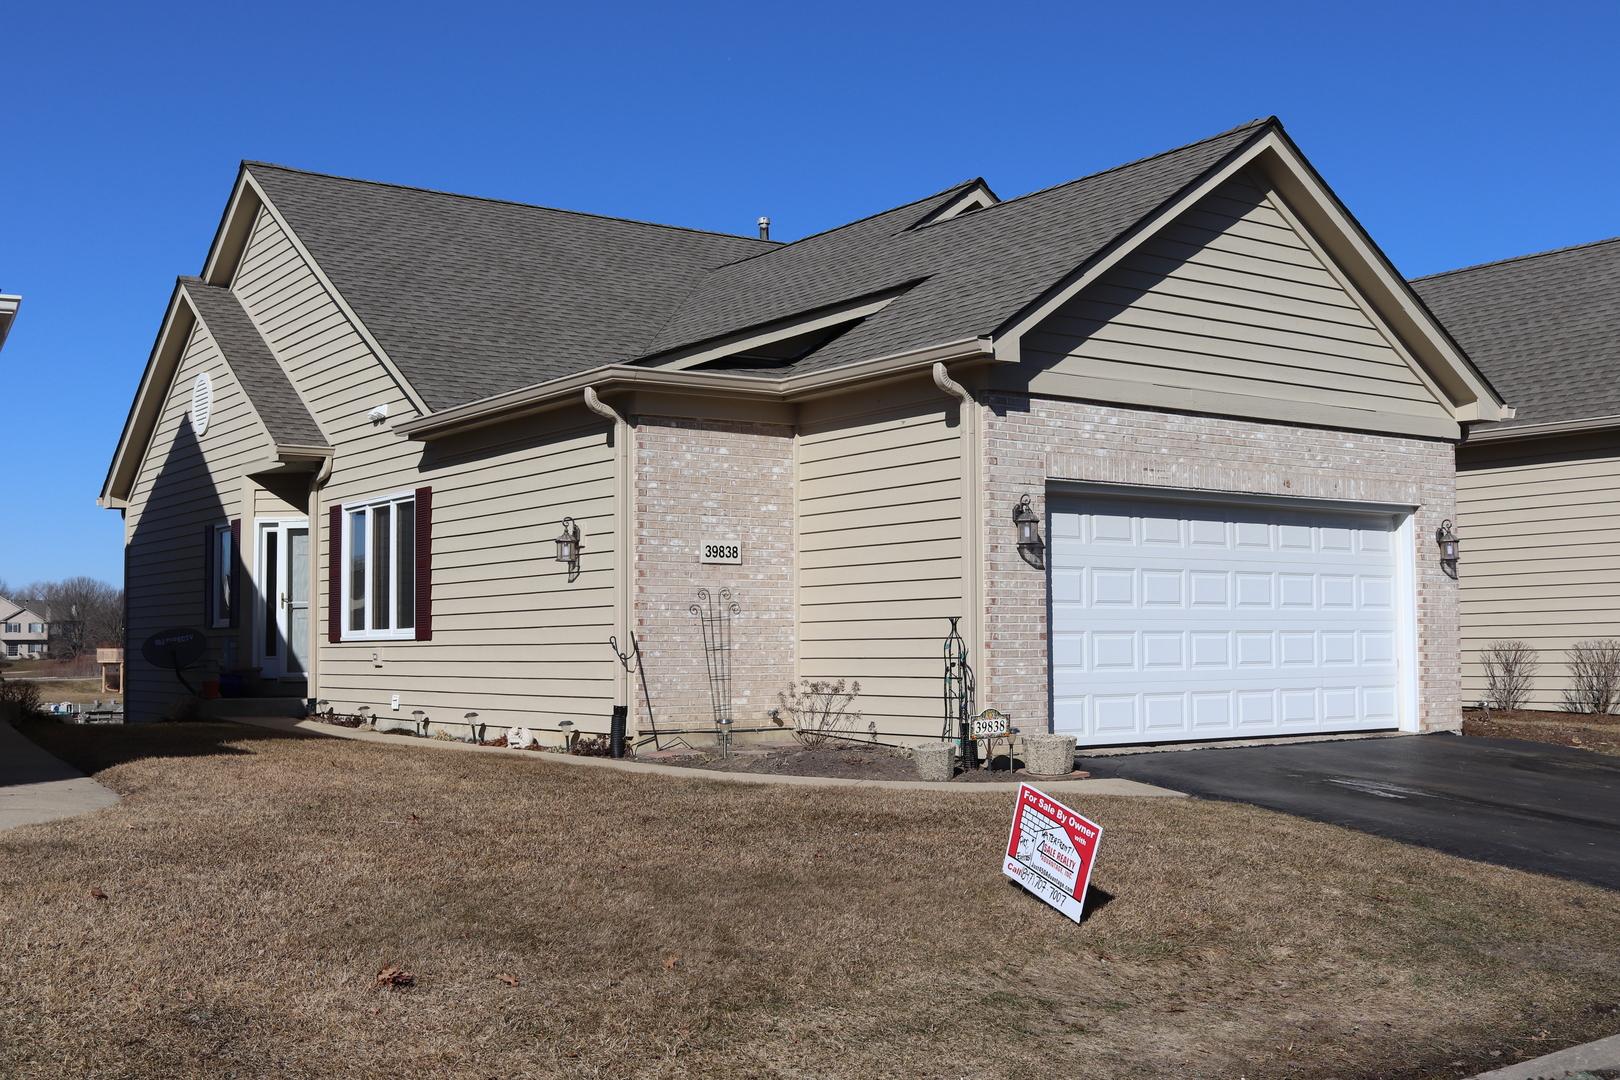 39838 N Long Drive, Antioch, IL 60002